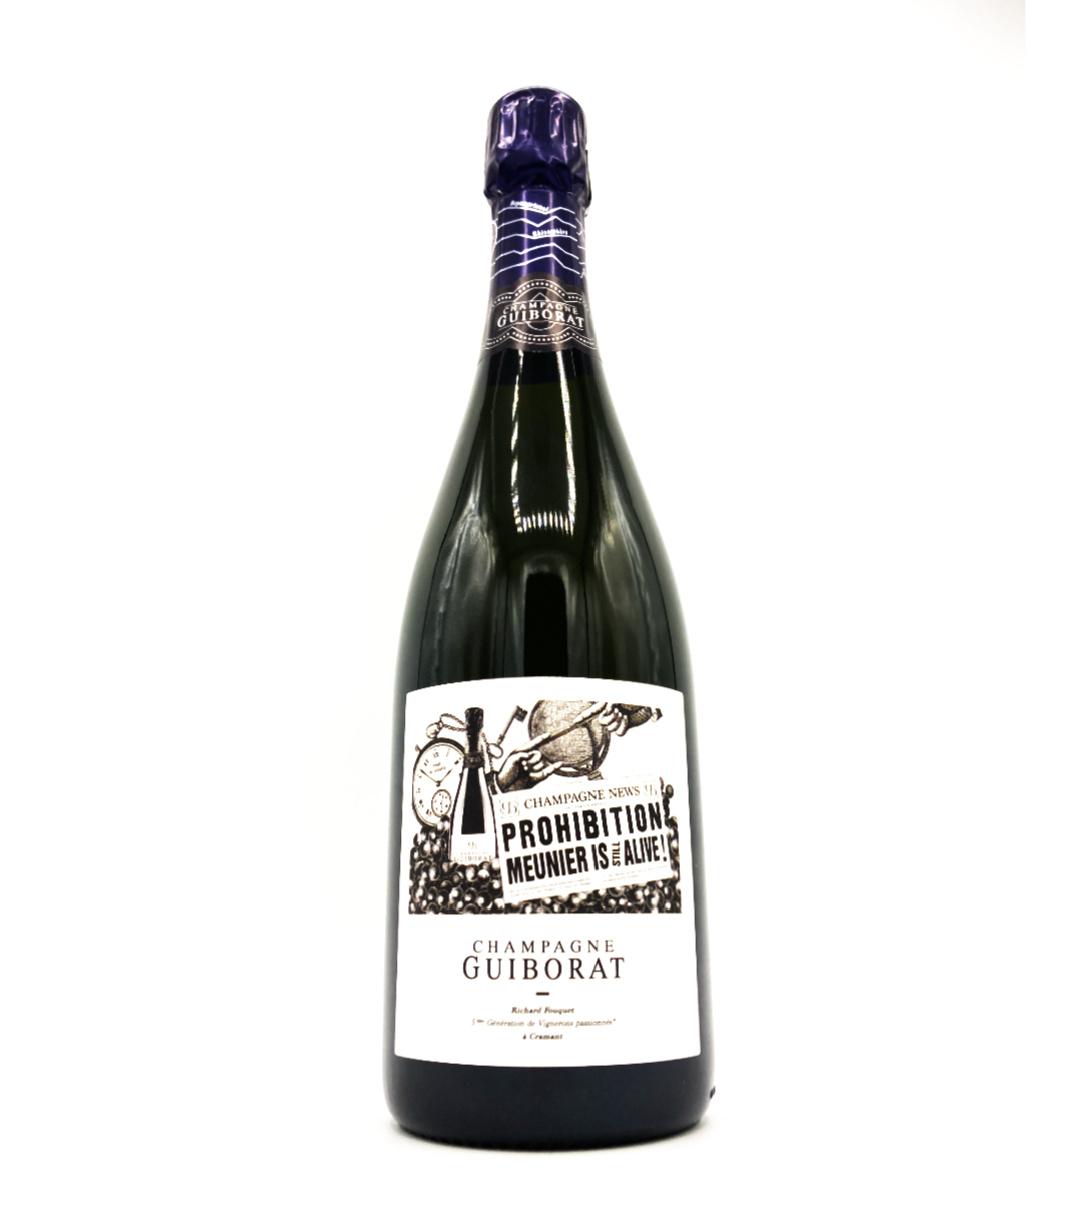 Champagne Extra Brut Prohibition NV Guiborat